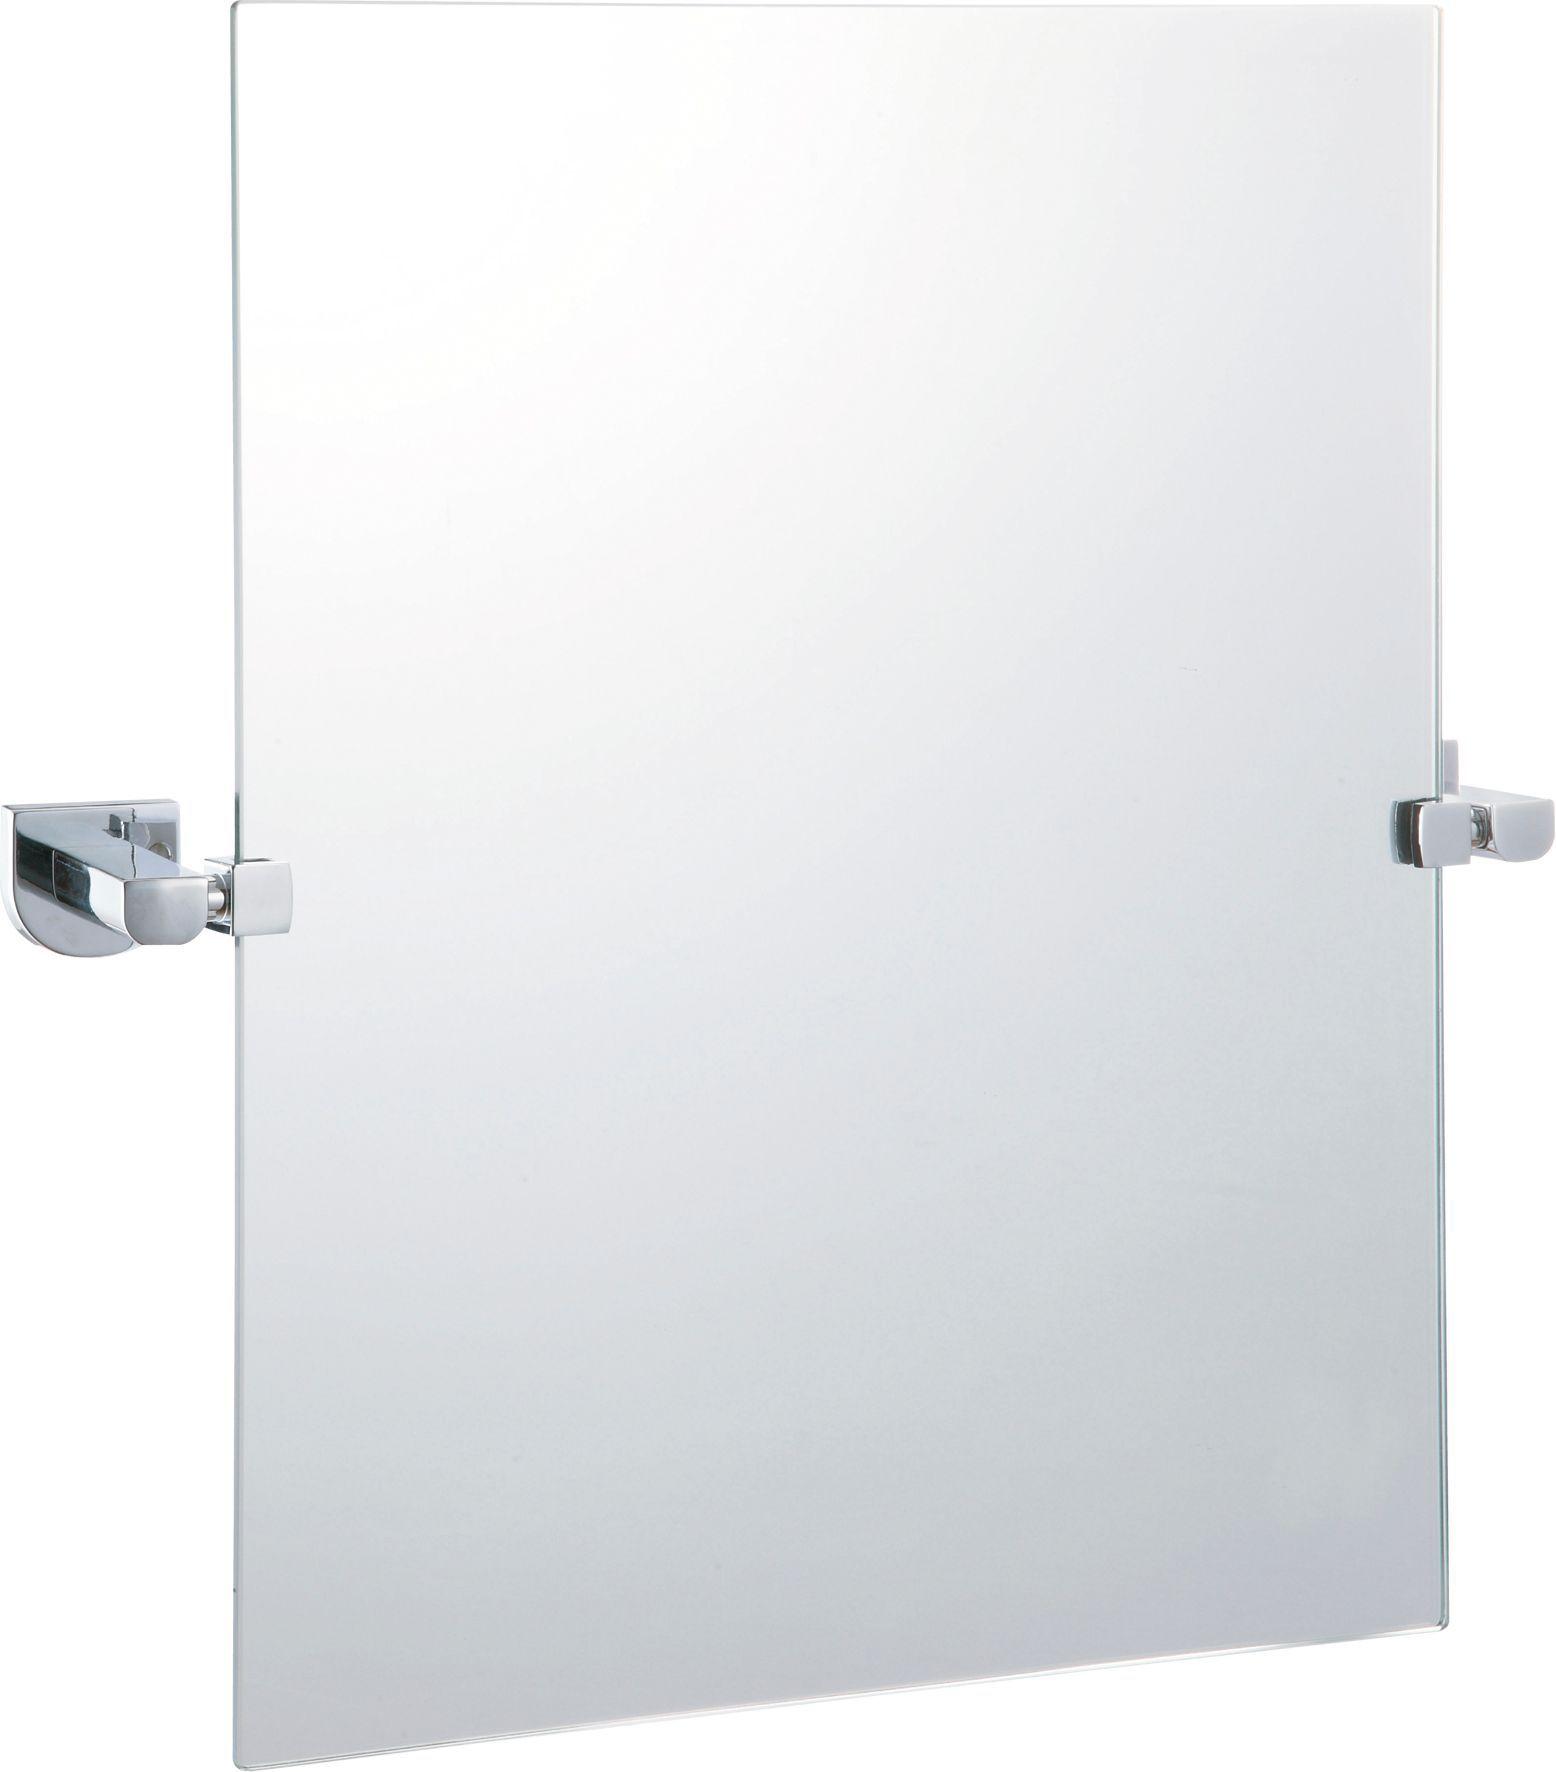 B&Q Axis Square Wall Mirror (W)497mm (H)500mm | Departments | DIY at B&Q